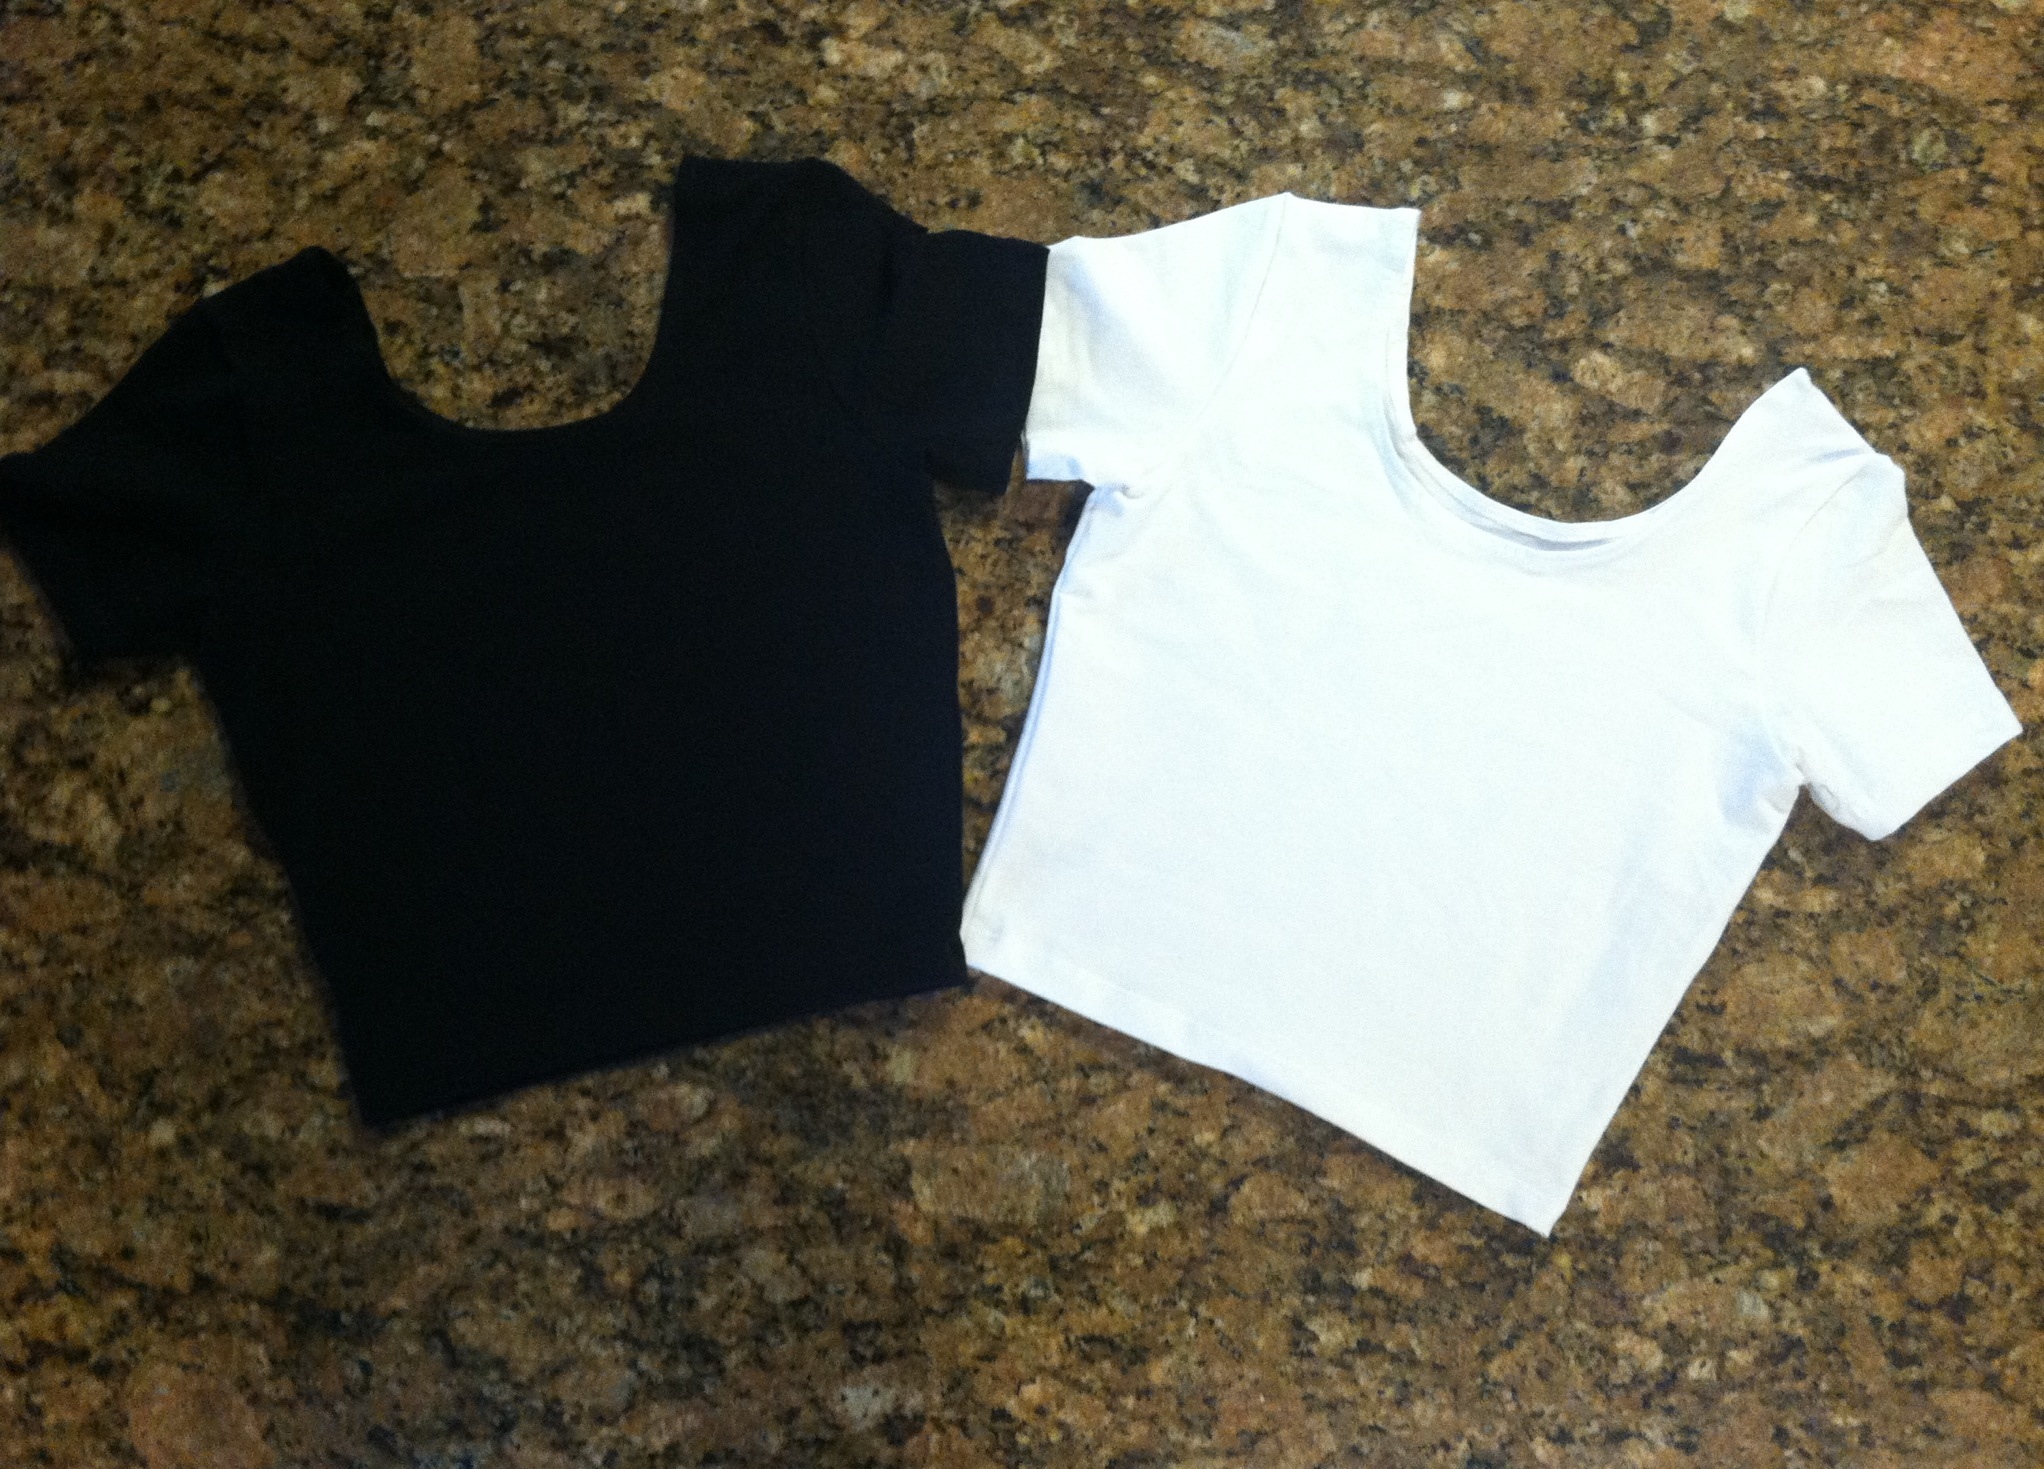 Plain Black & White Crop Top from Lauren Alexandra on Storenvy